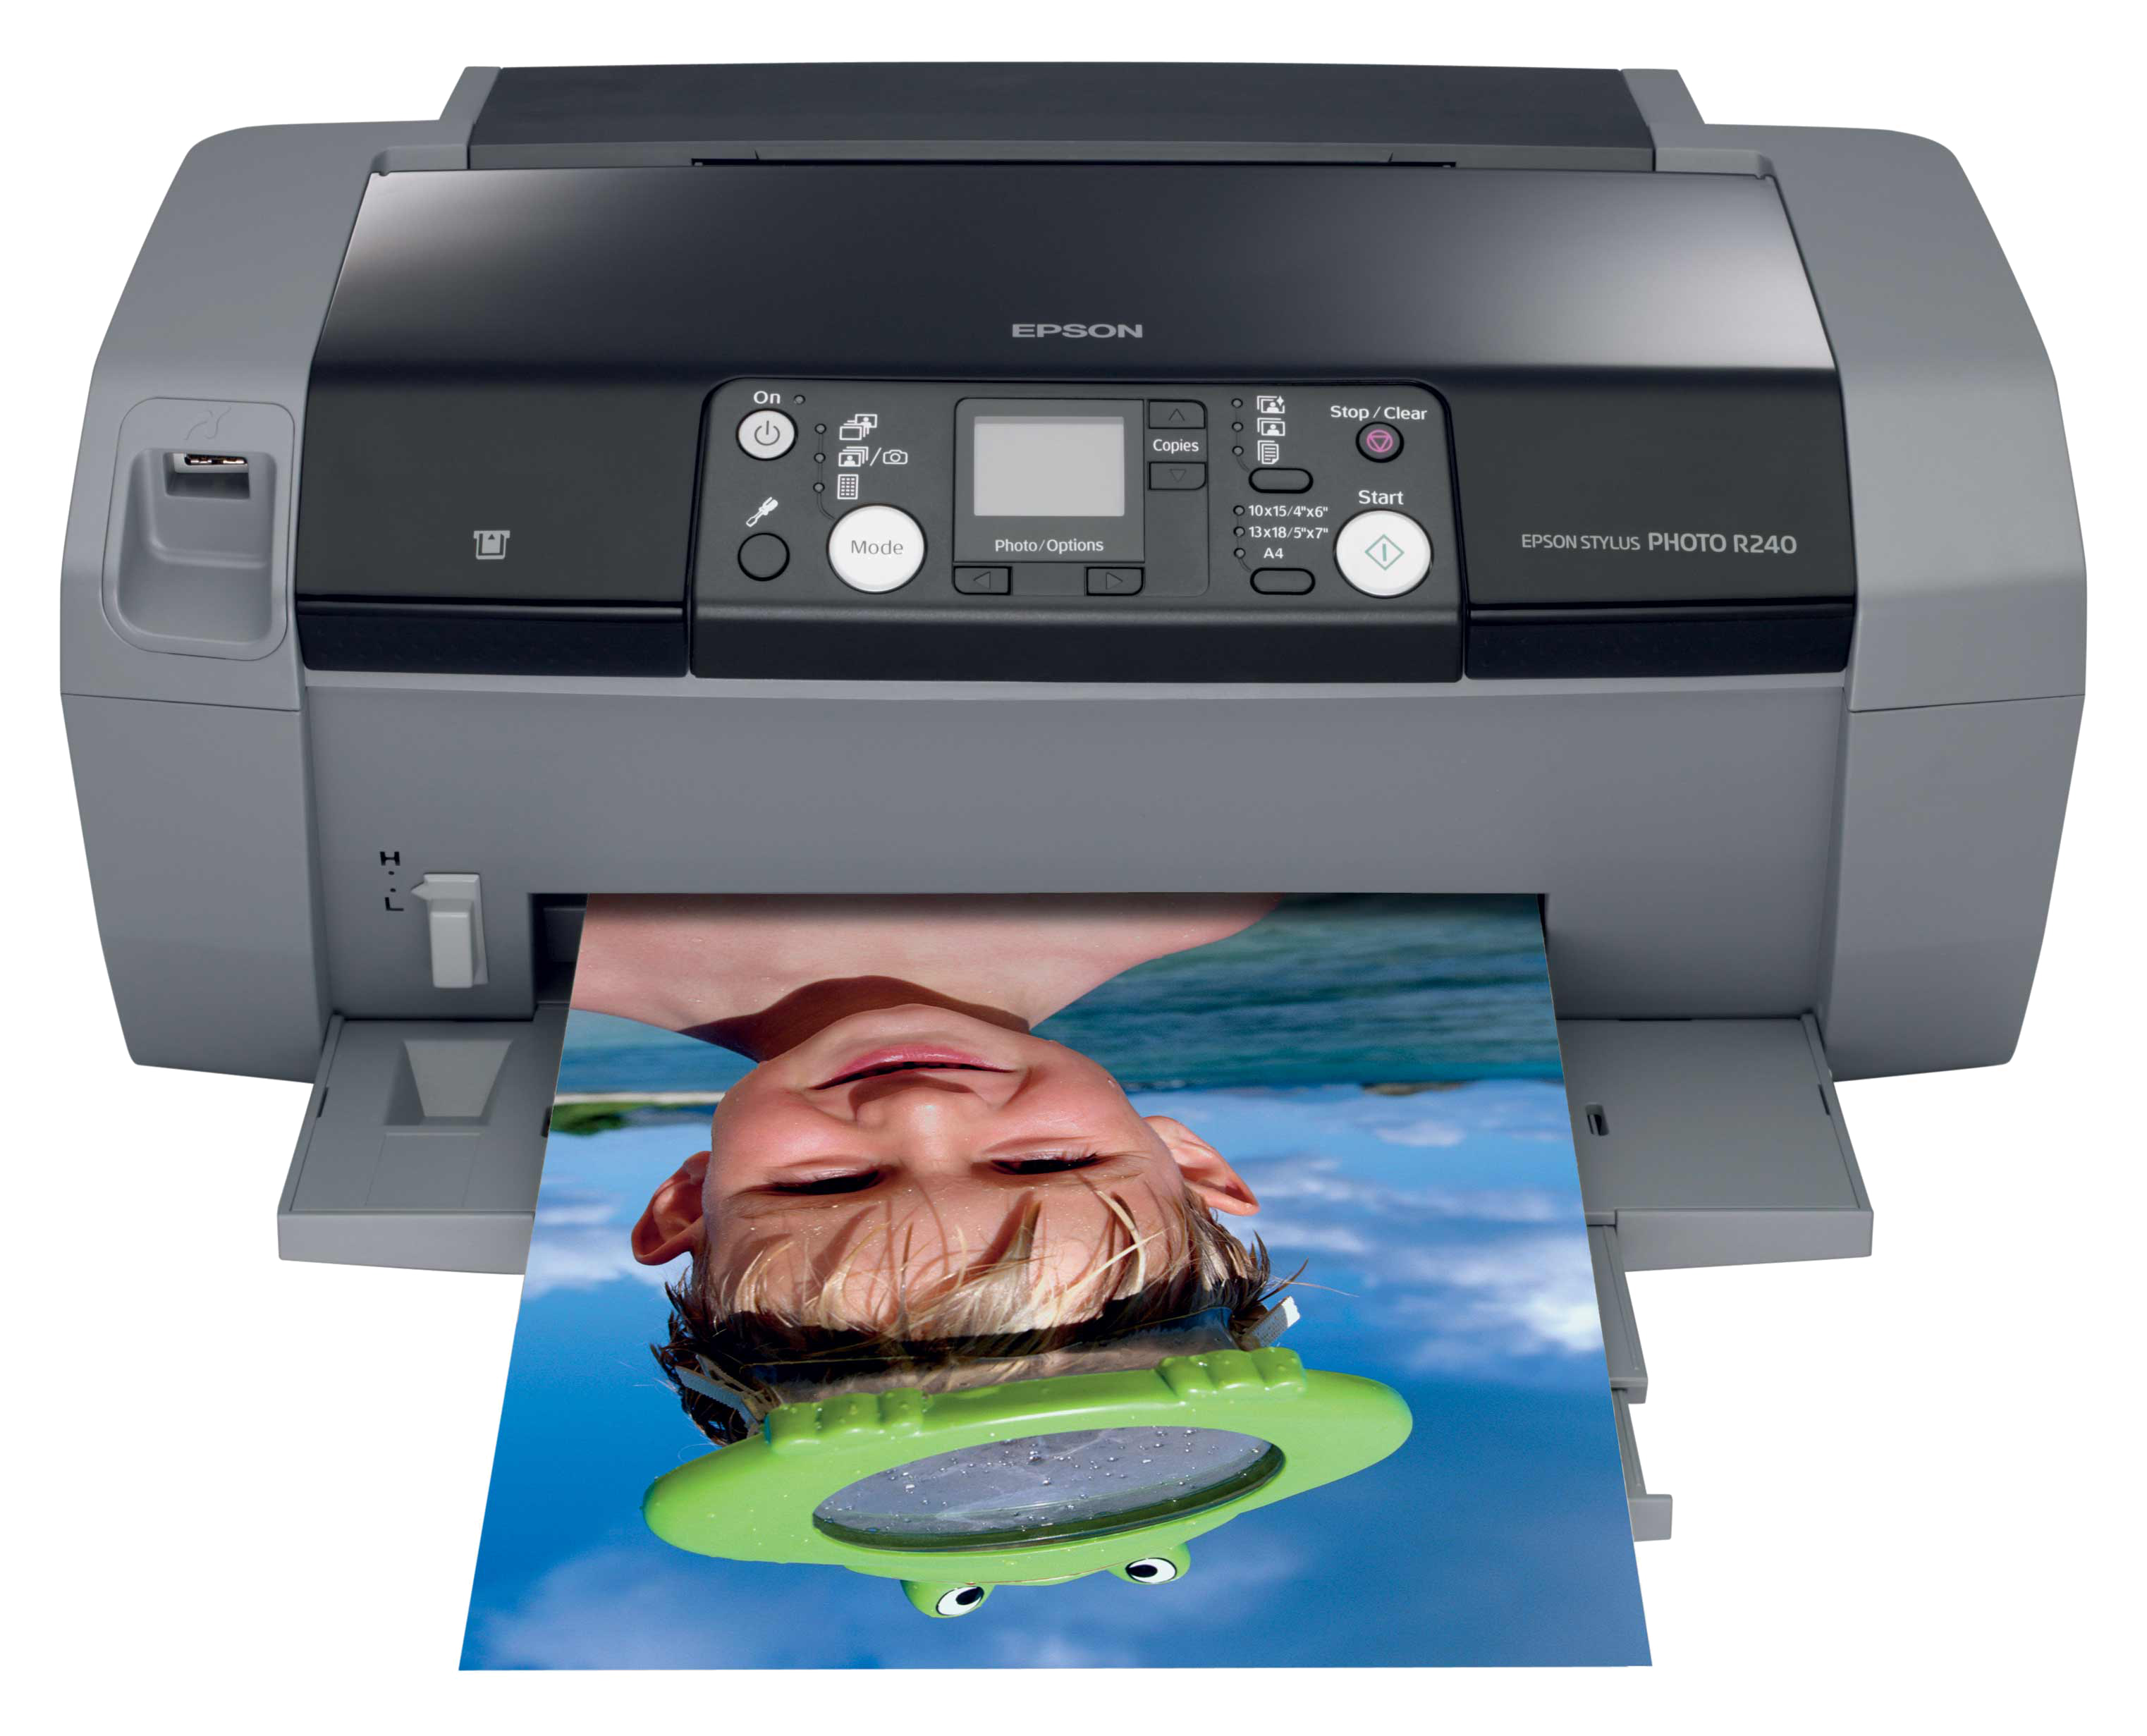 Printer Download Png PNG Image - Printer PNG HD